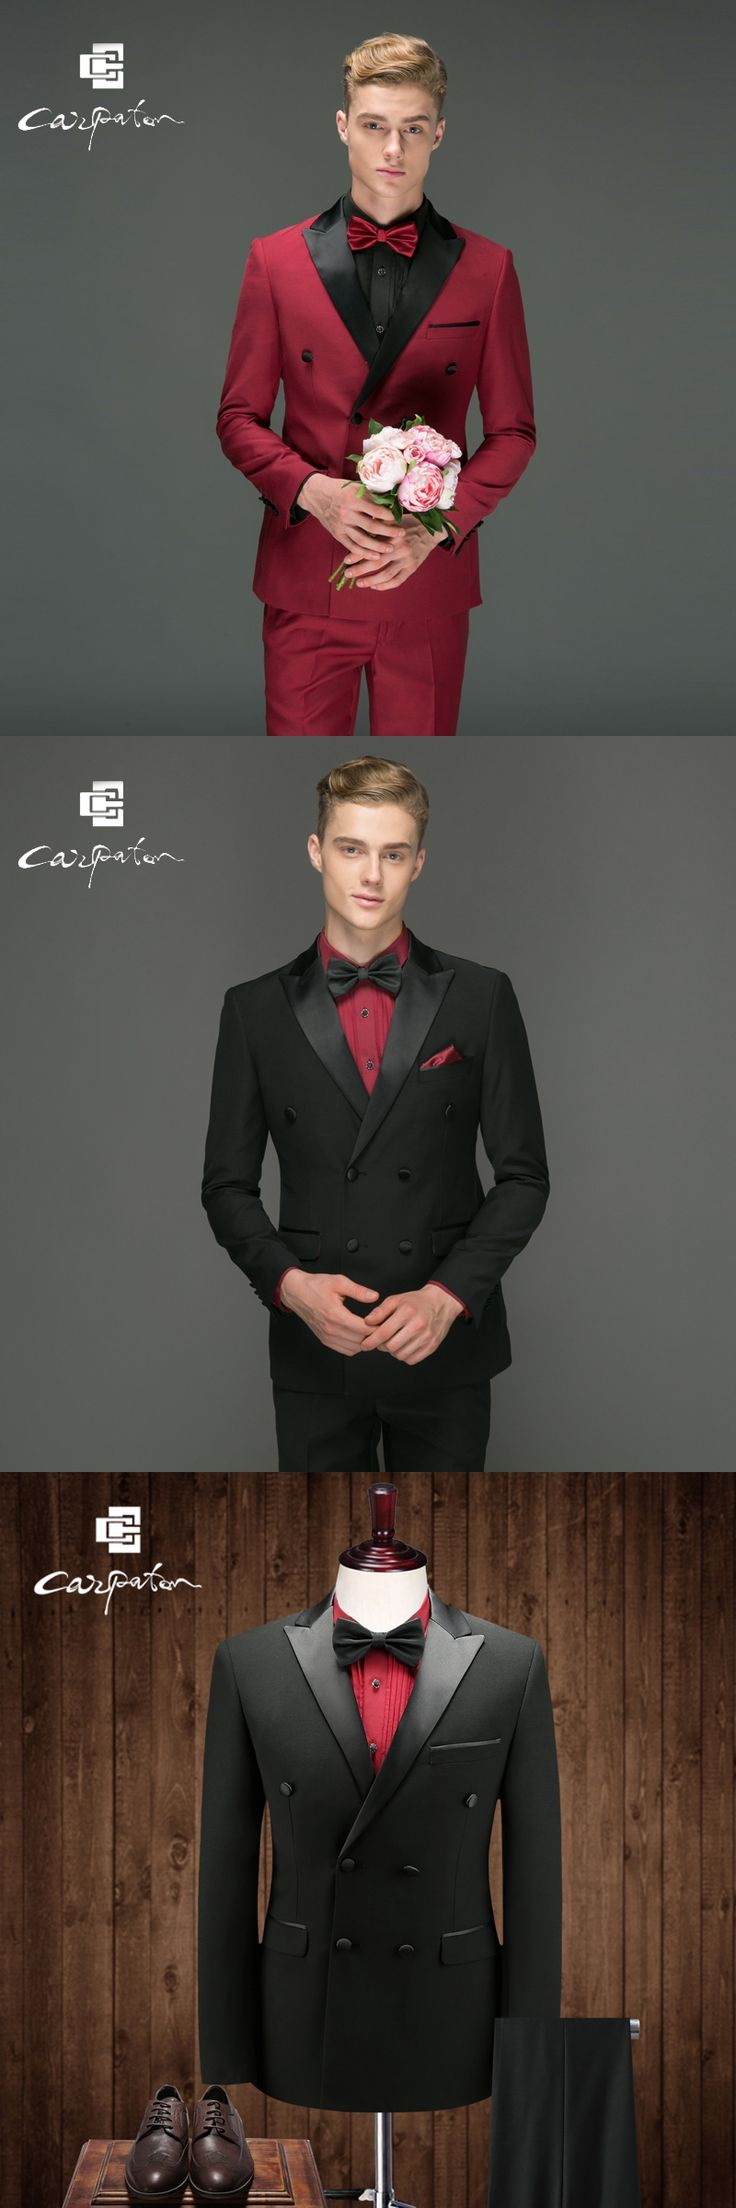 Carpaton Men Suit Black Wool Designer 2PCS Suit Double Breasted Brand Skinny Tuxedo Large Size Grooms Wedding Suits For Men Host